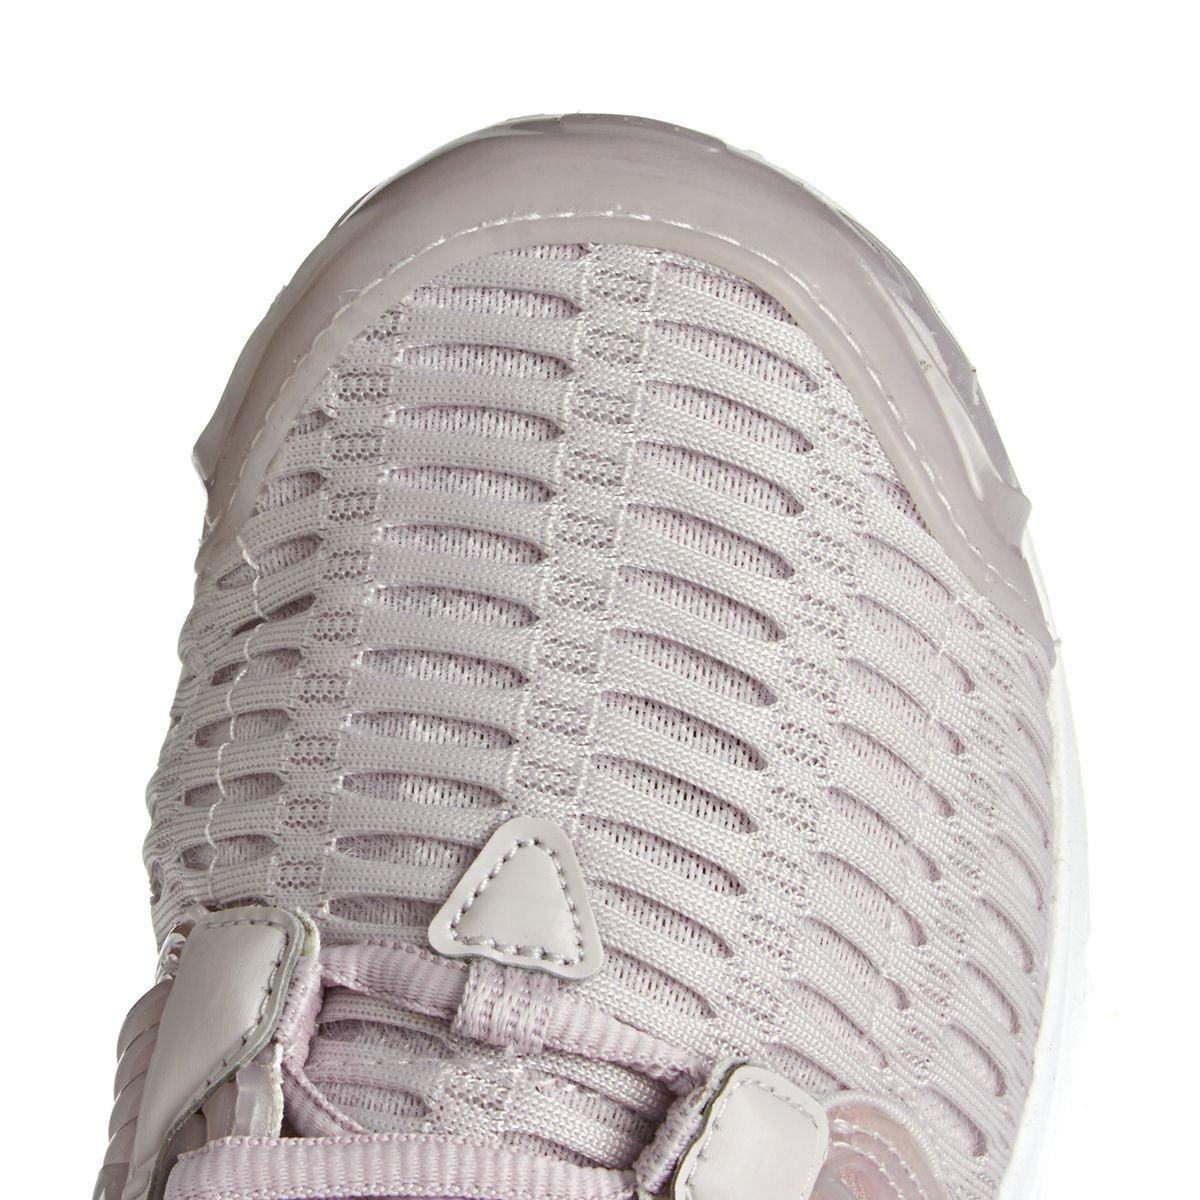 1 Adidas BA8575Trainer Adidas Climacool Herren Herren Climacool 1 BA8575Trainer Adidas Herren Climacool Lq5Ac34Rj